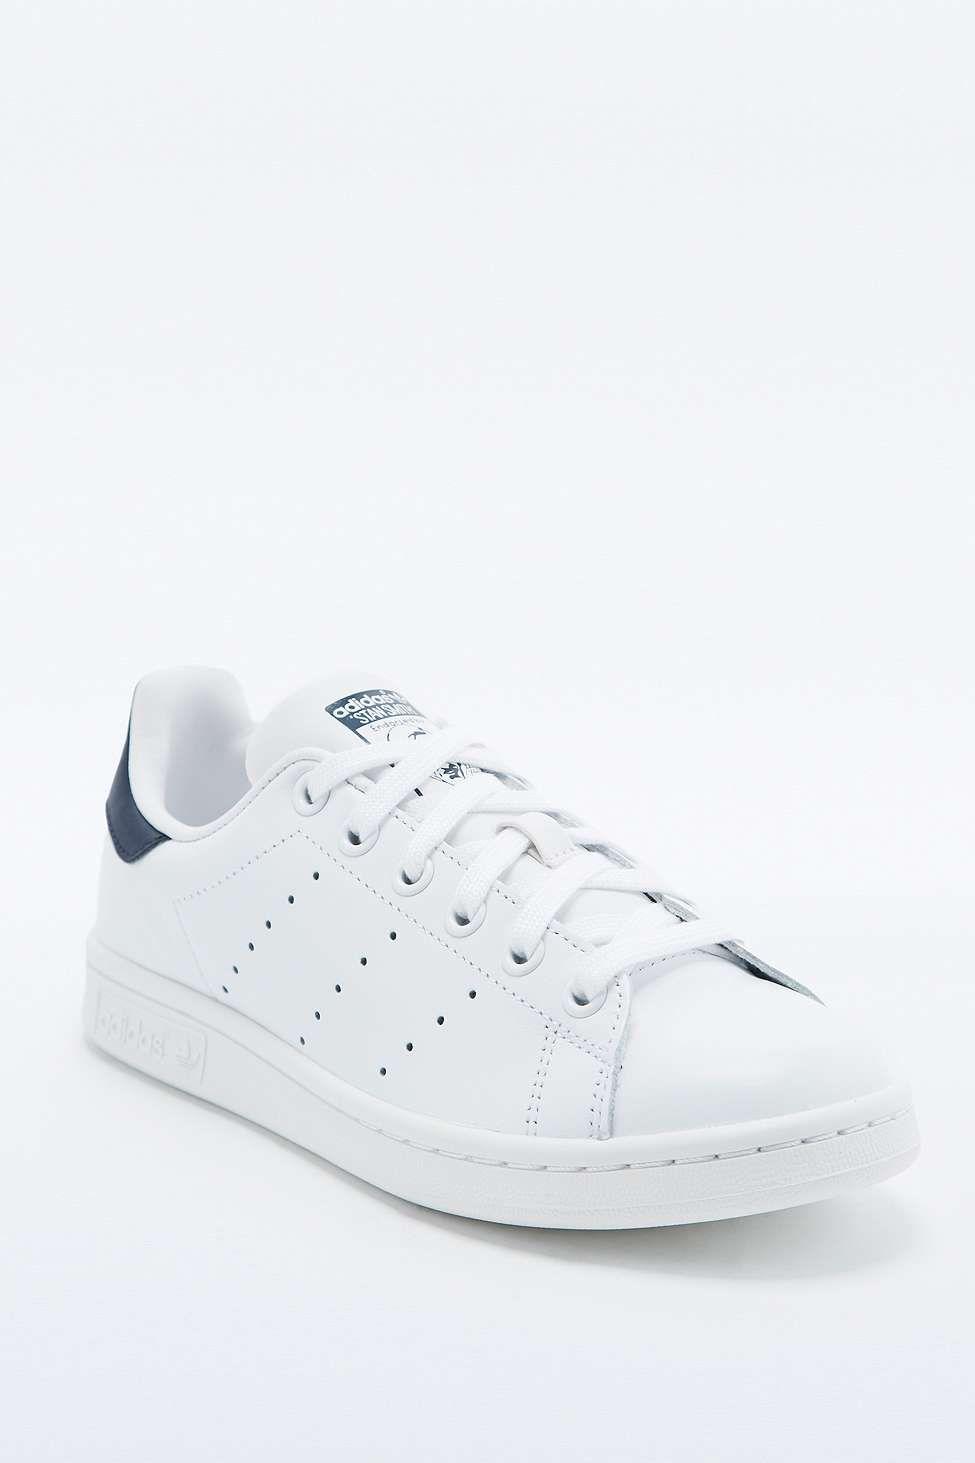 acheter populaire 5e3c6 1ee95 adidas Originals - Baskets Stan Smith blanches et bleu ...